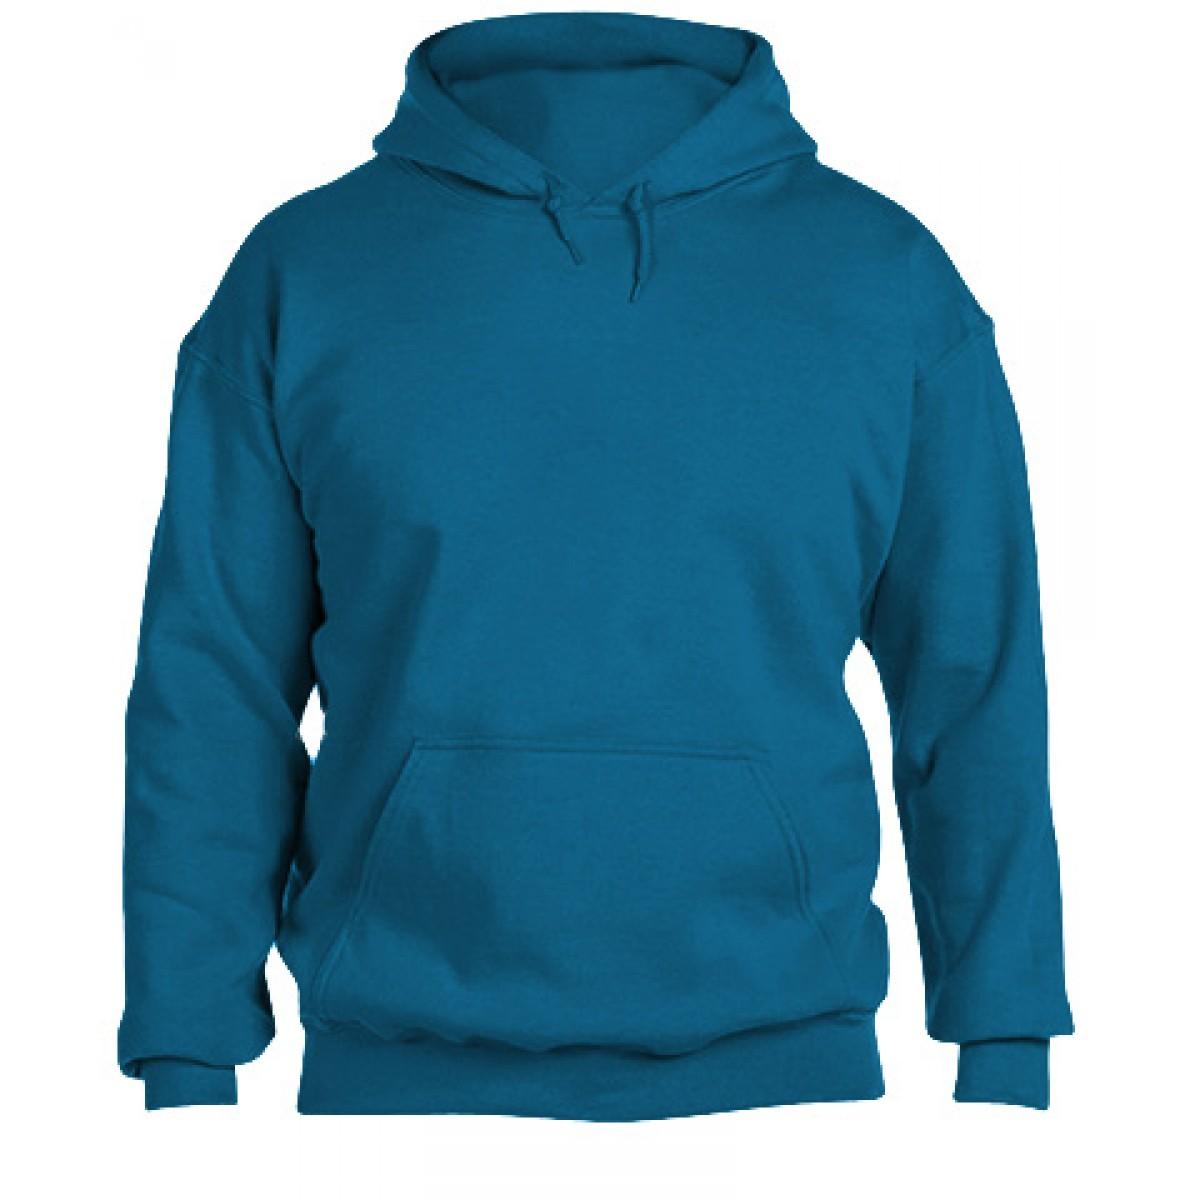 Hooded Sweatshirt 50/50 Heavy Blend -Sapphire-3XL